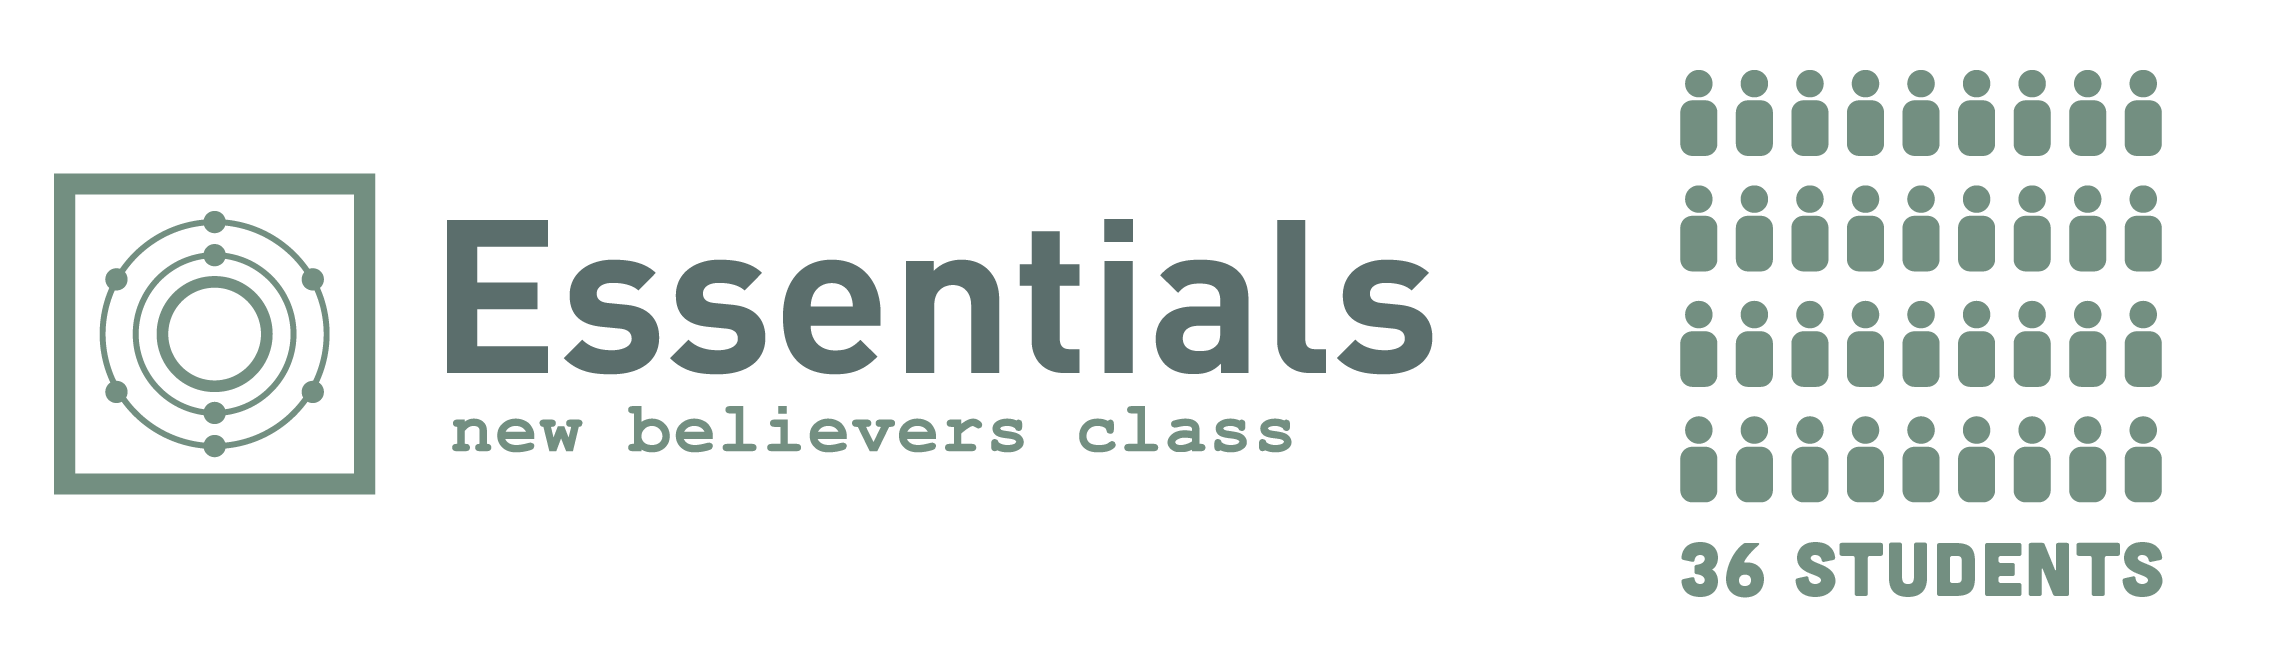 YearEnd_06_Essentials.png